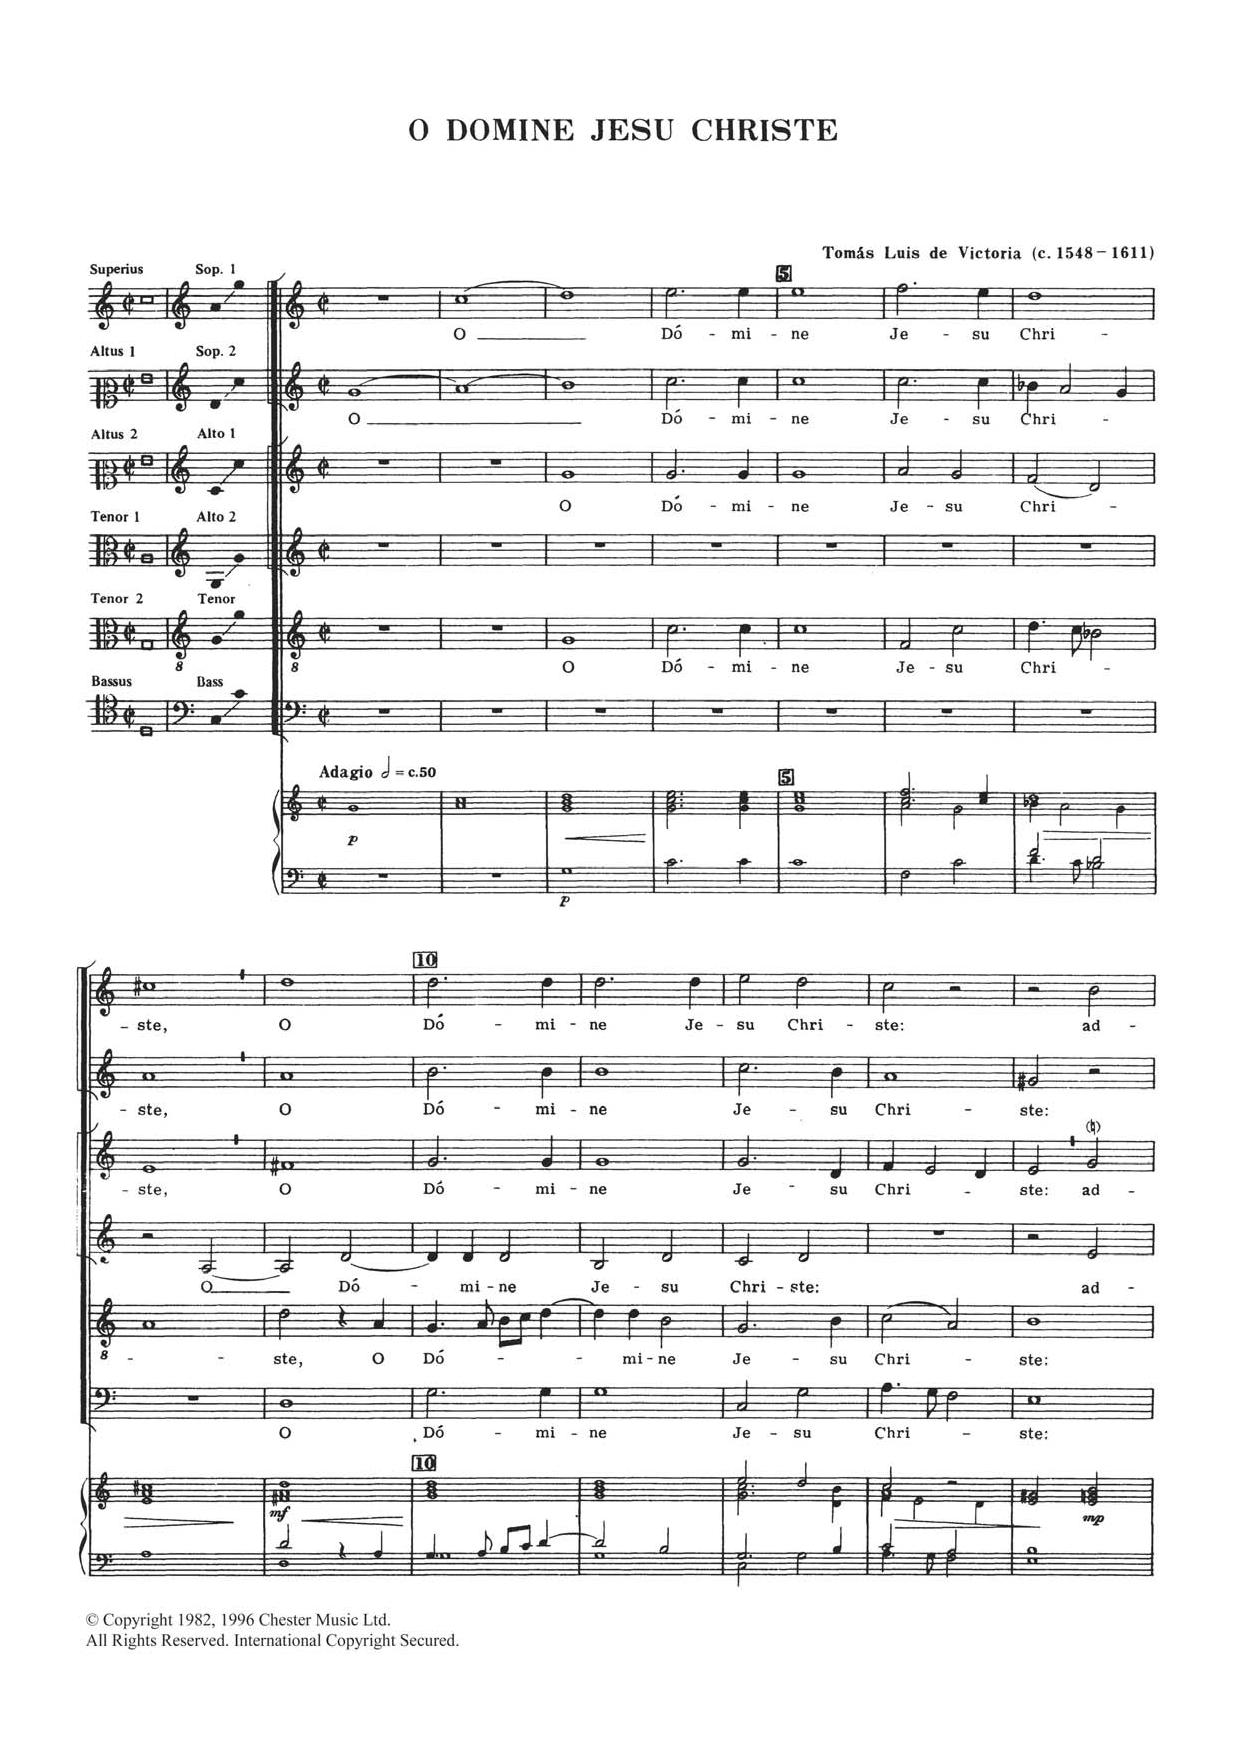 O Domine Jesu Christe Sheet Music